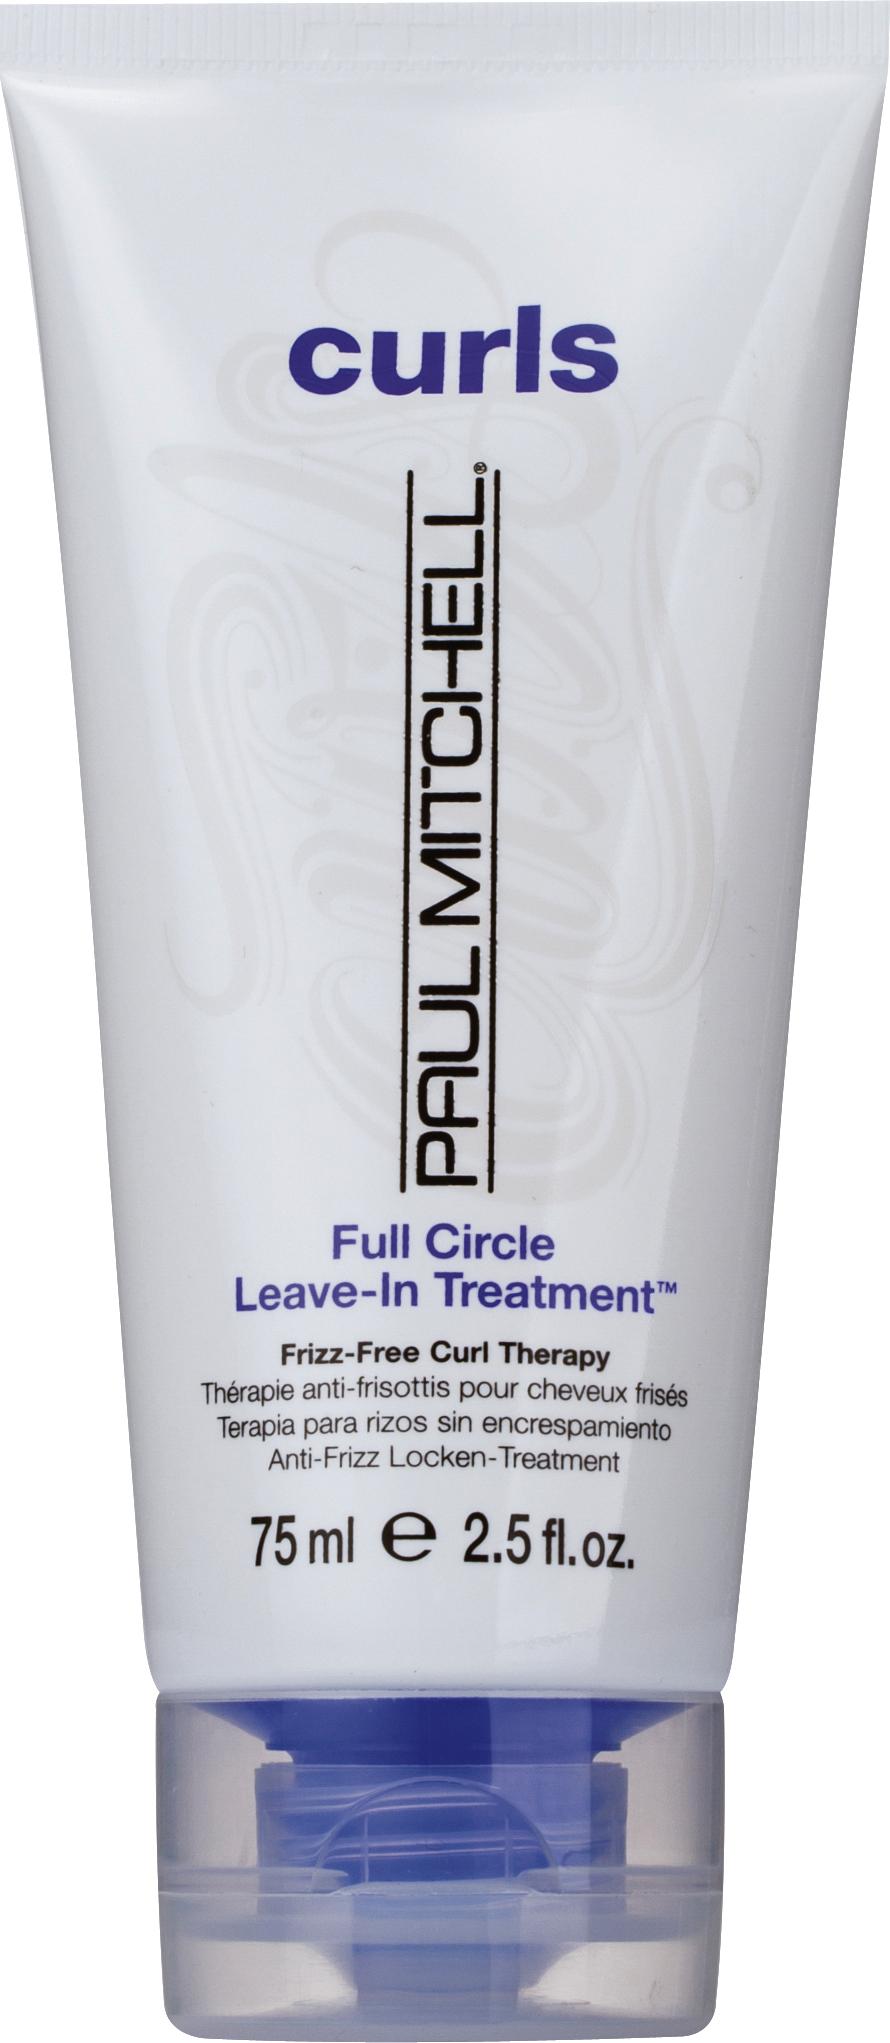 Paul Mitchell Full Circle Leave-In Treatment® 75ml | curls | Paul ...